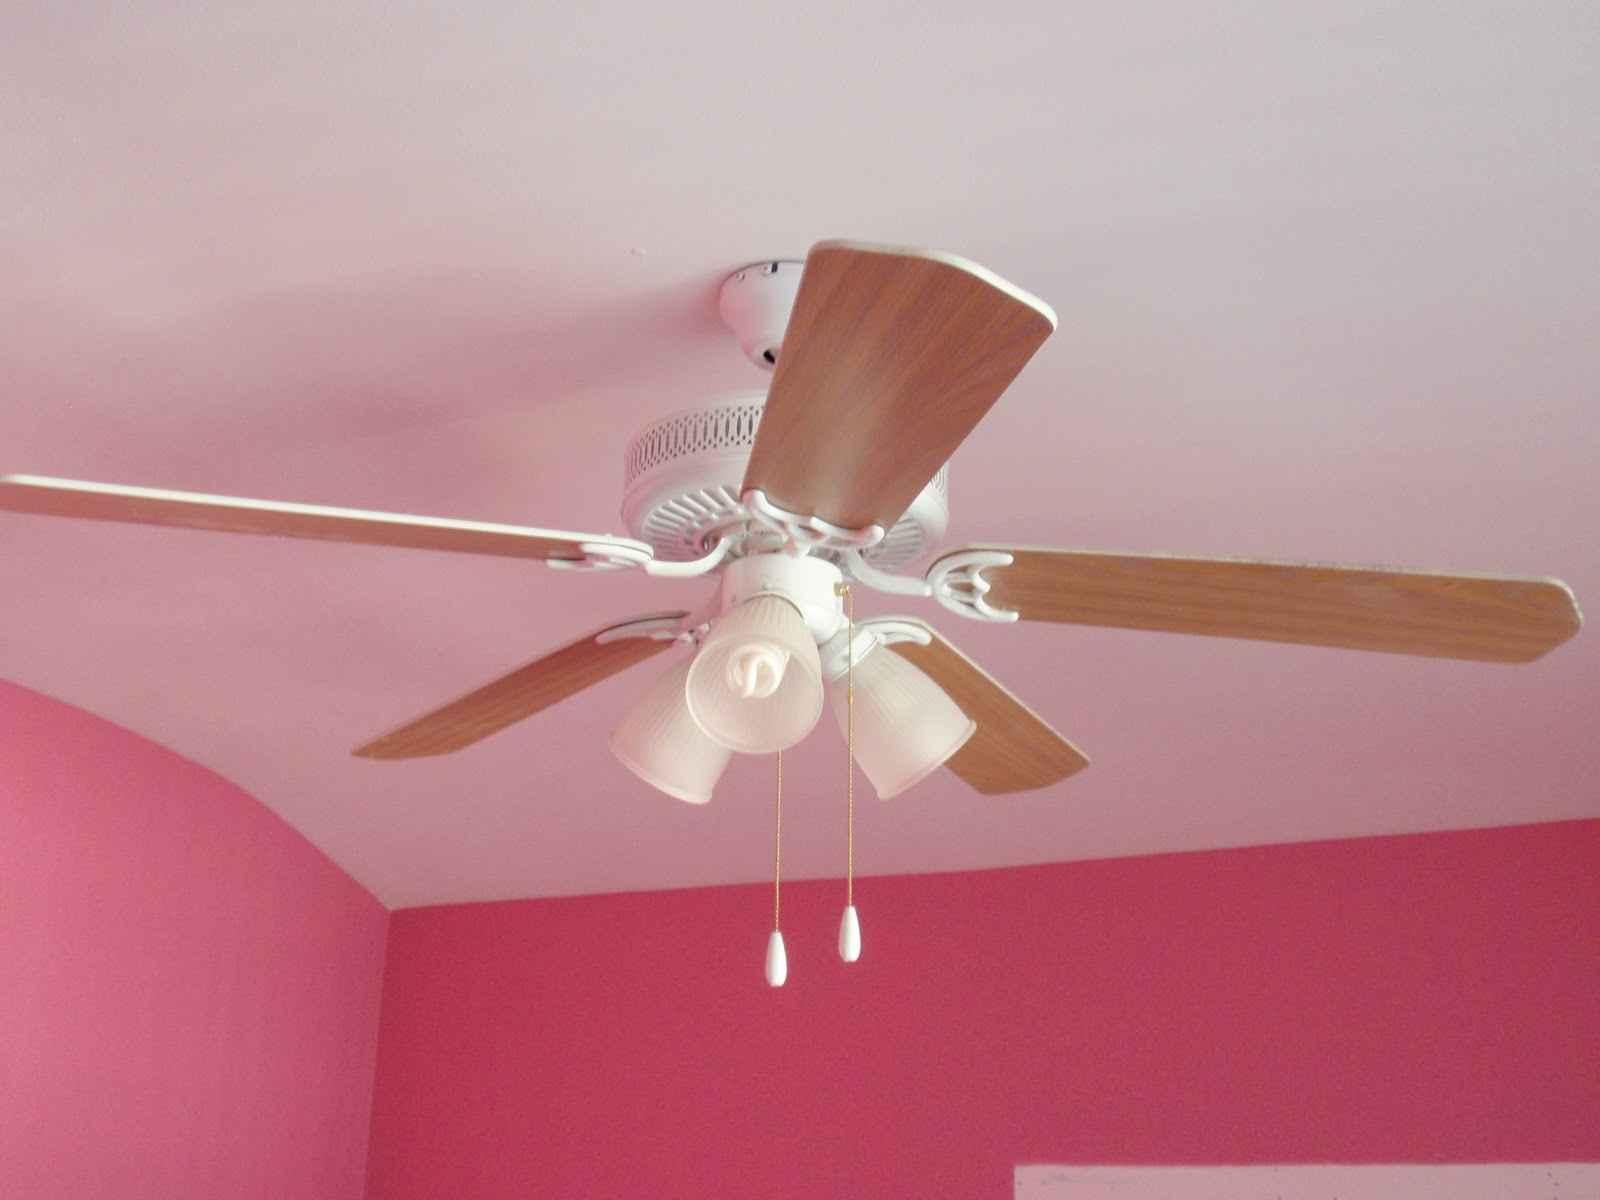 Design#6831020: Ceiling Fans Bedroom – 17 Best ideas about Bedroom ...